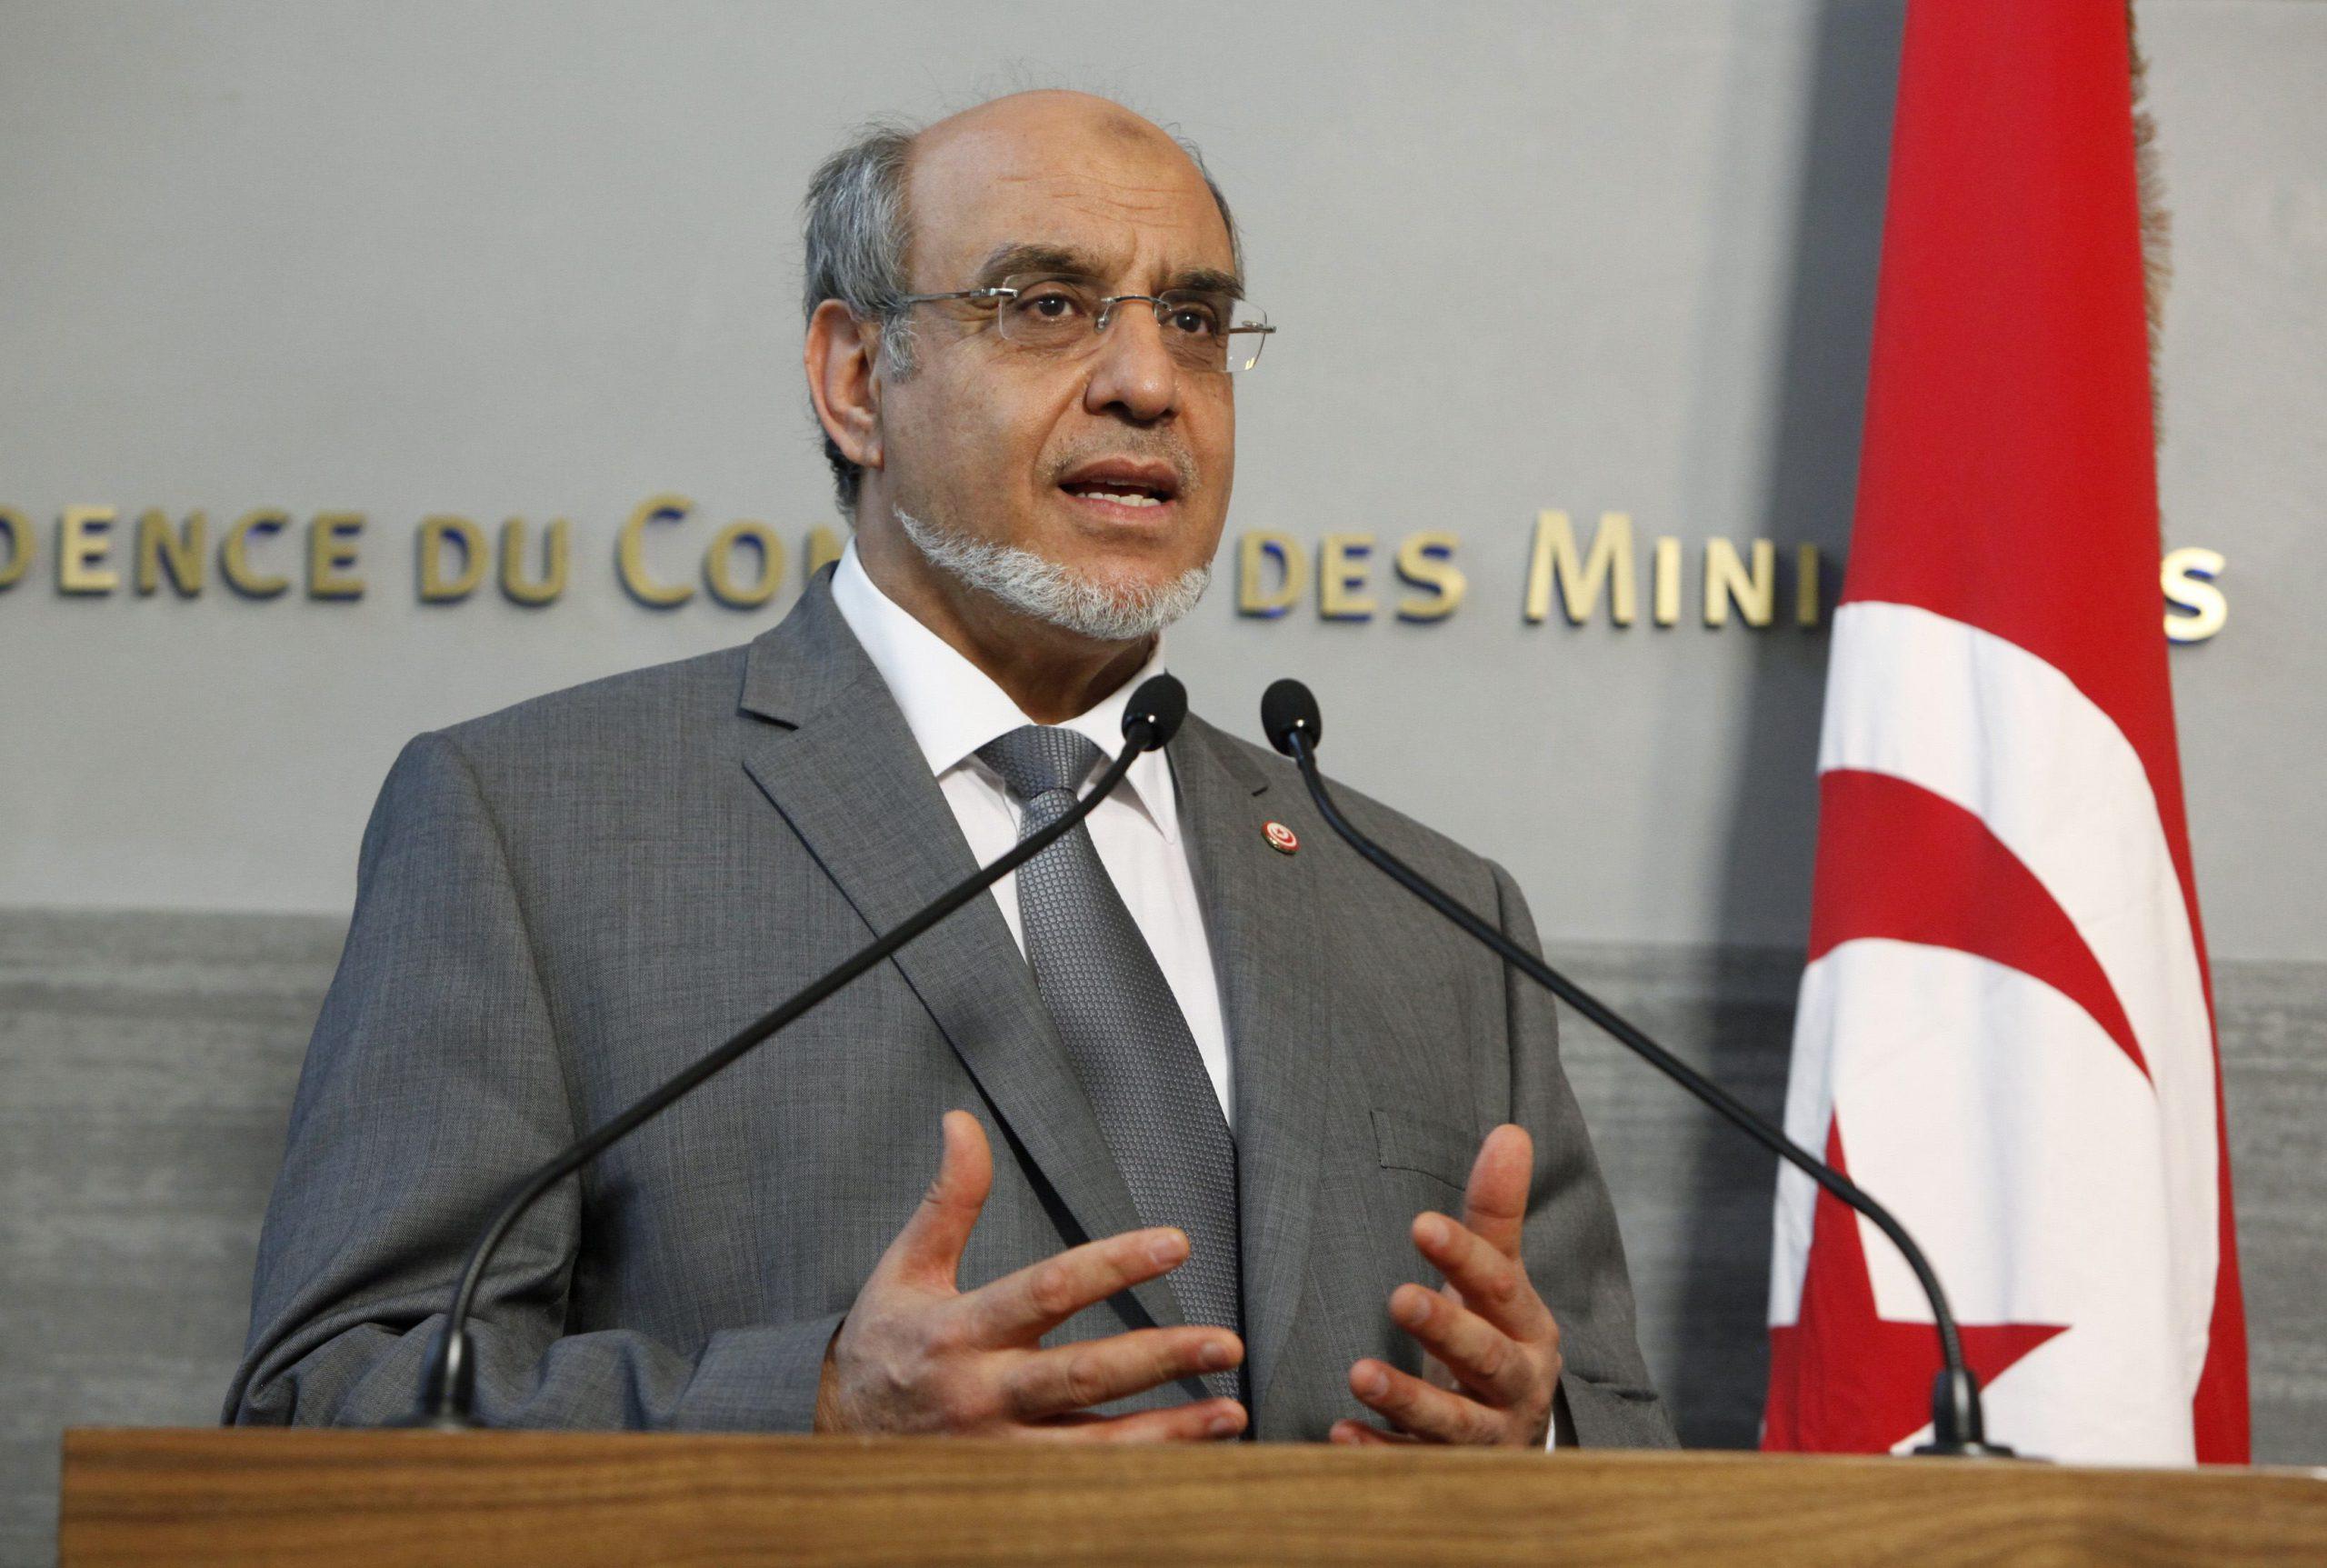 M. Hamadi Yabali, Ex Primer Ministro de Túnez